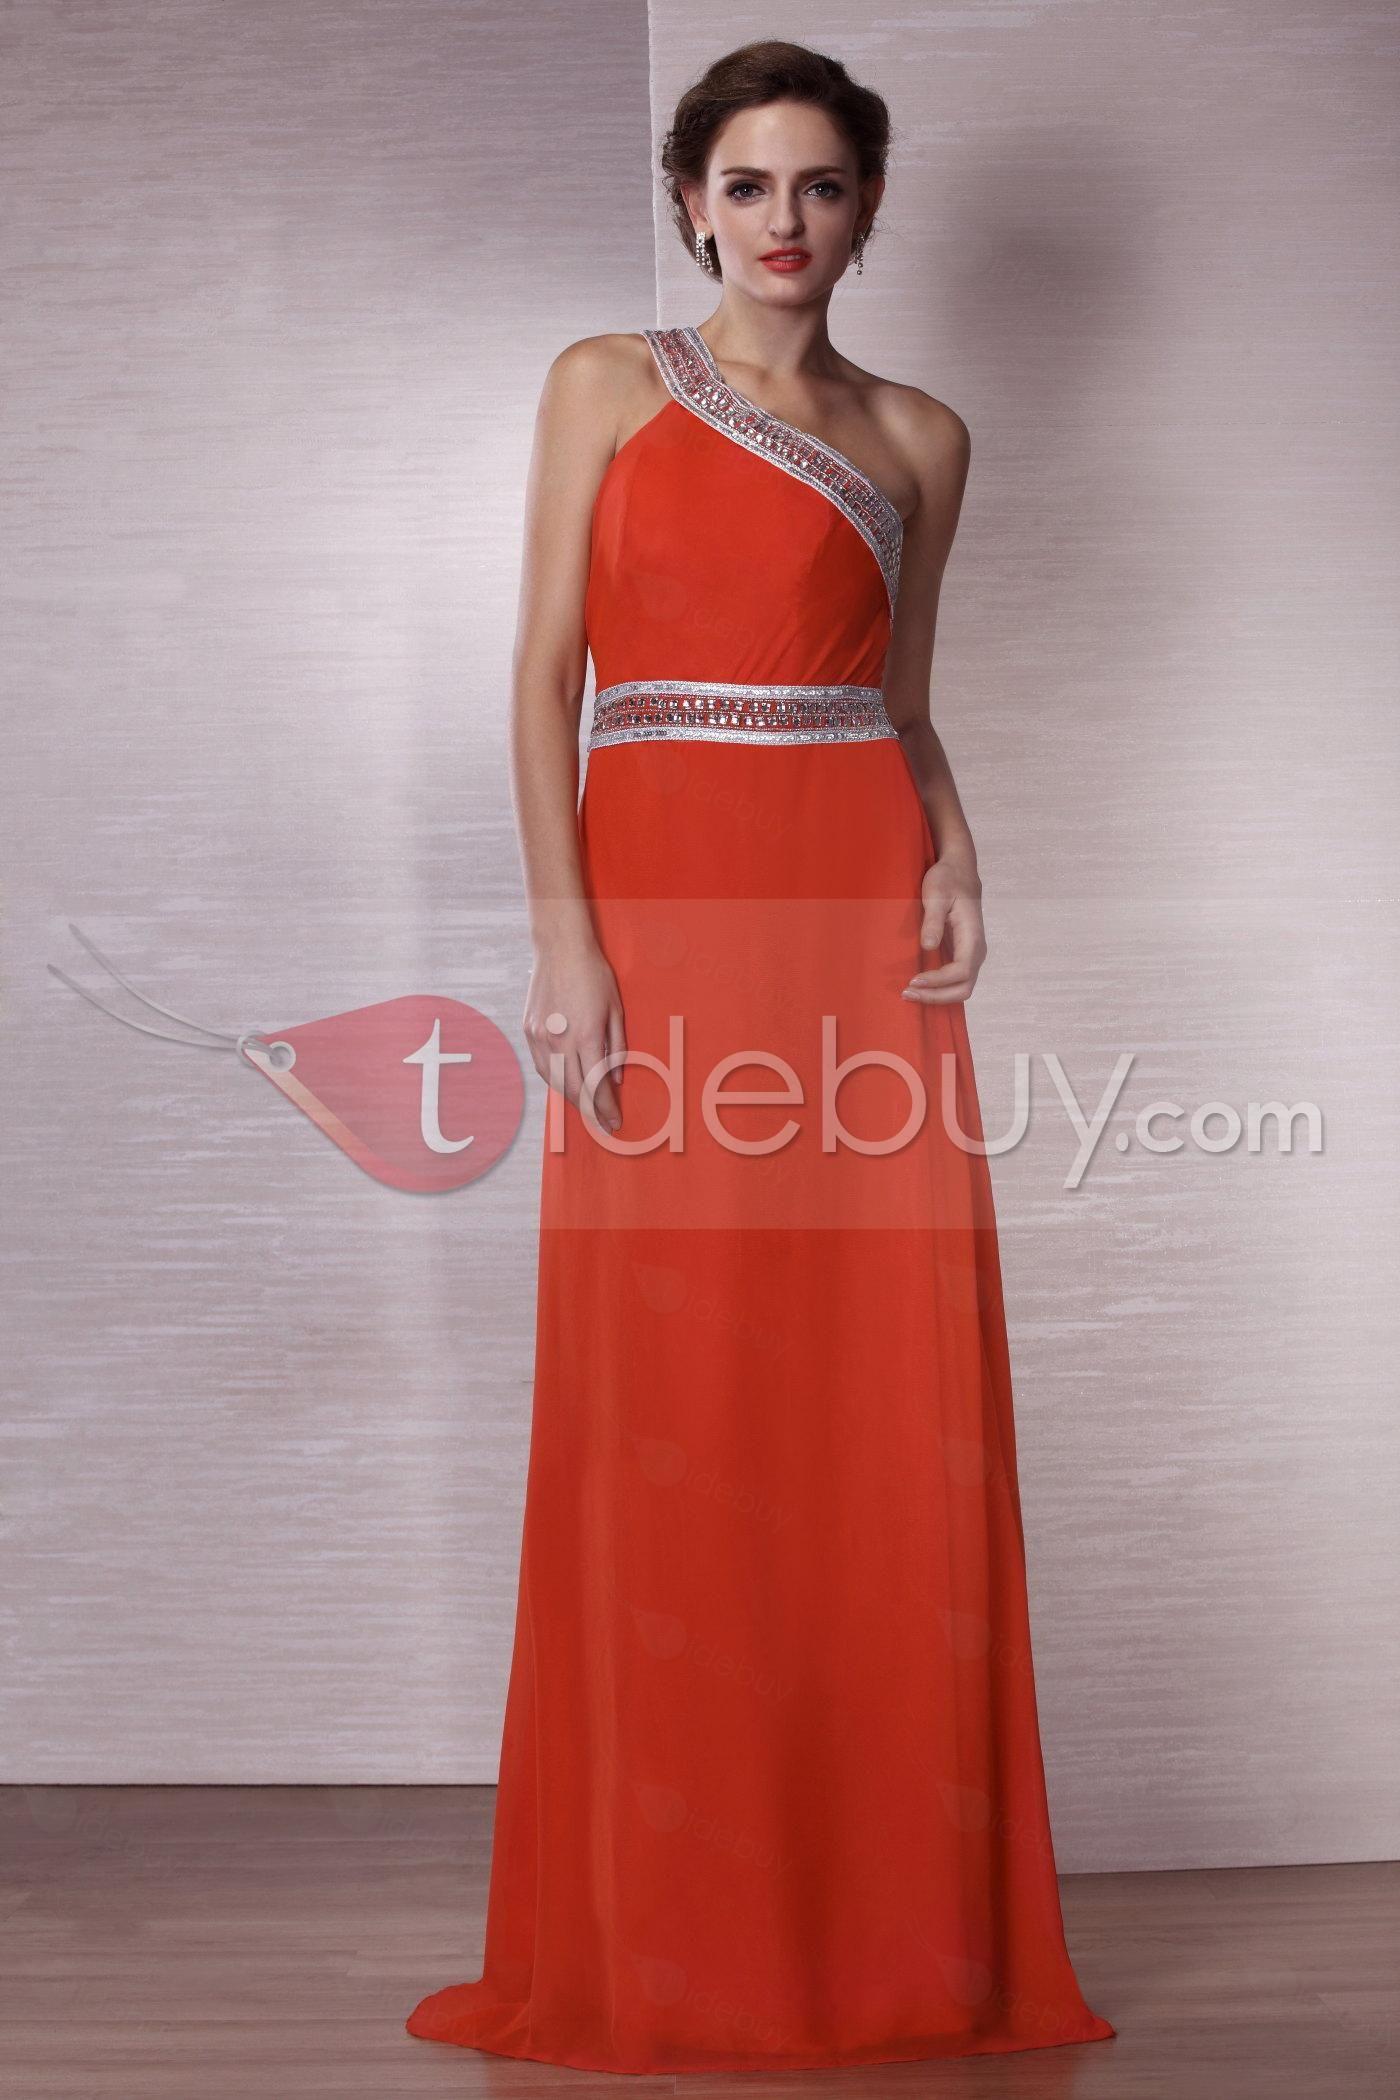 Clearance Sexy A-Line Floor-Length One-Shoulder Evening Dress ec86cf2ed